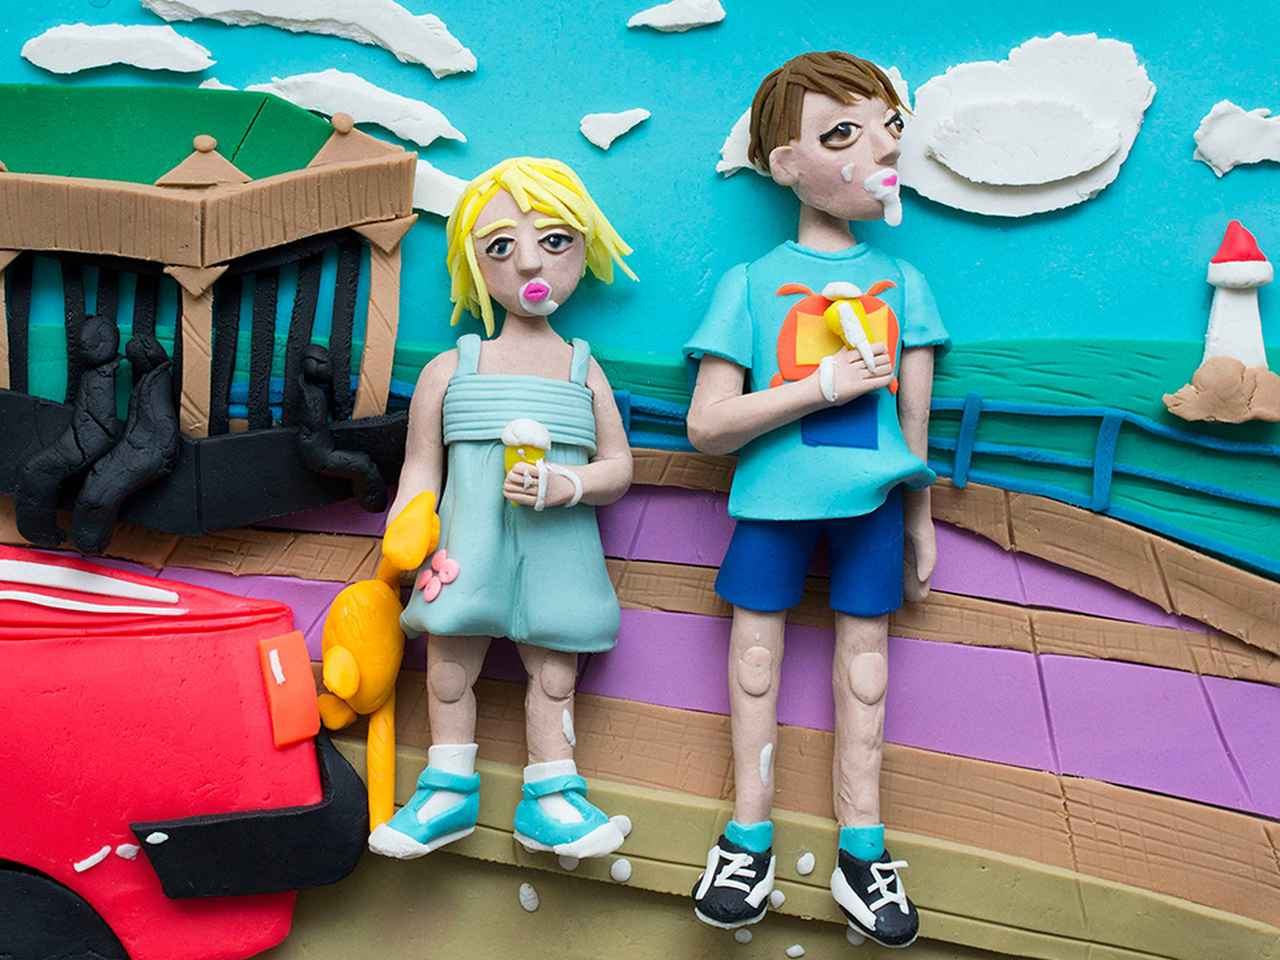 Images : 3番目の画像 - 「おもちゃの粘土で再解釈された 10枚の歴史的写真」のアルバム - T JAPAN:The New York Times Style Magazine 公式サイト